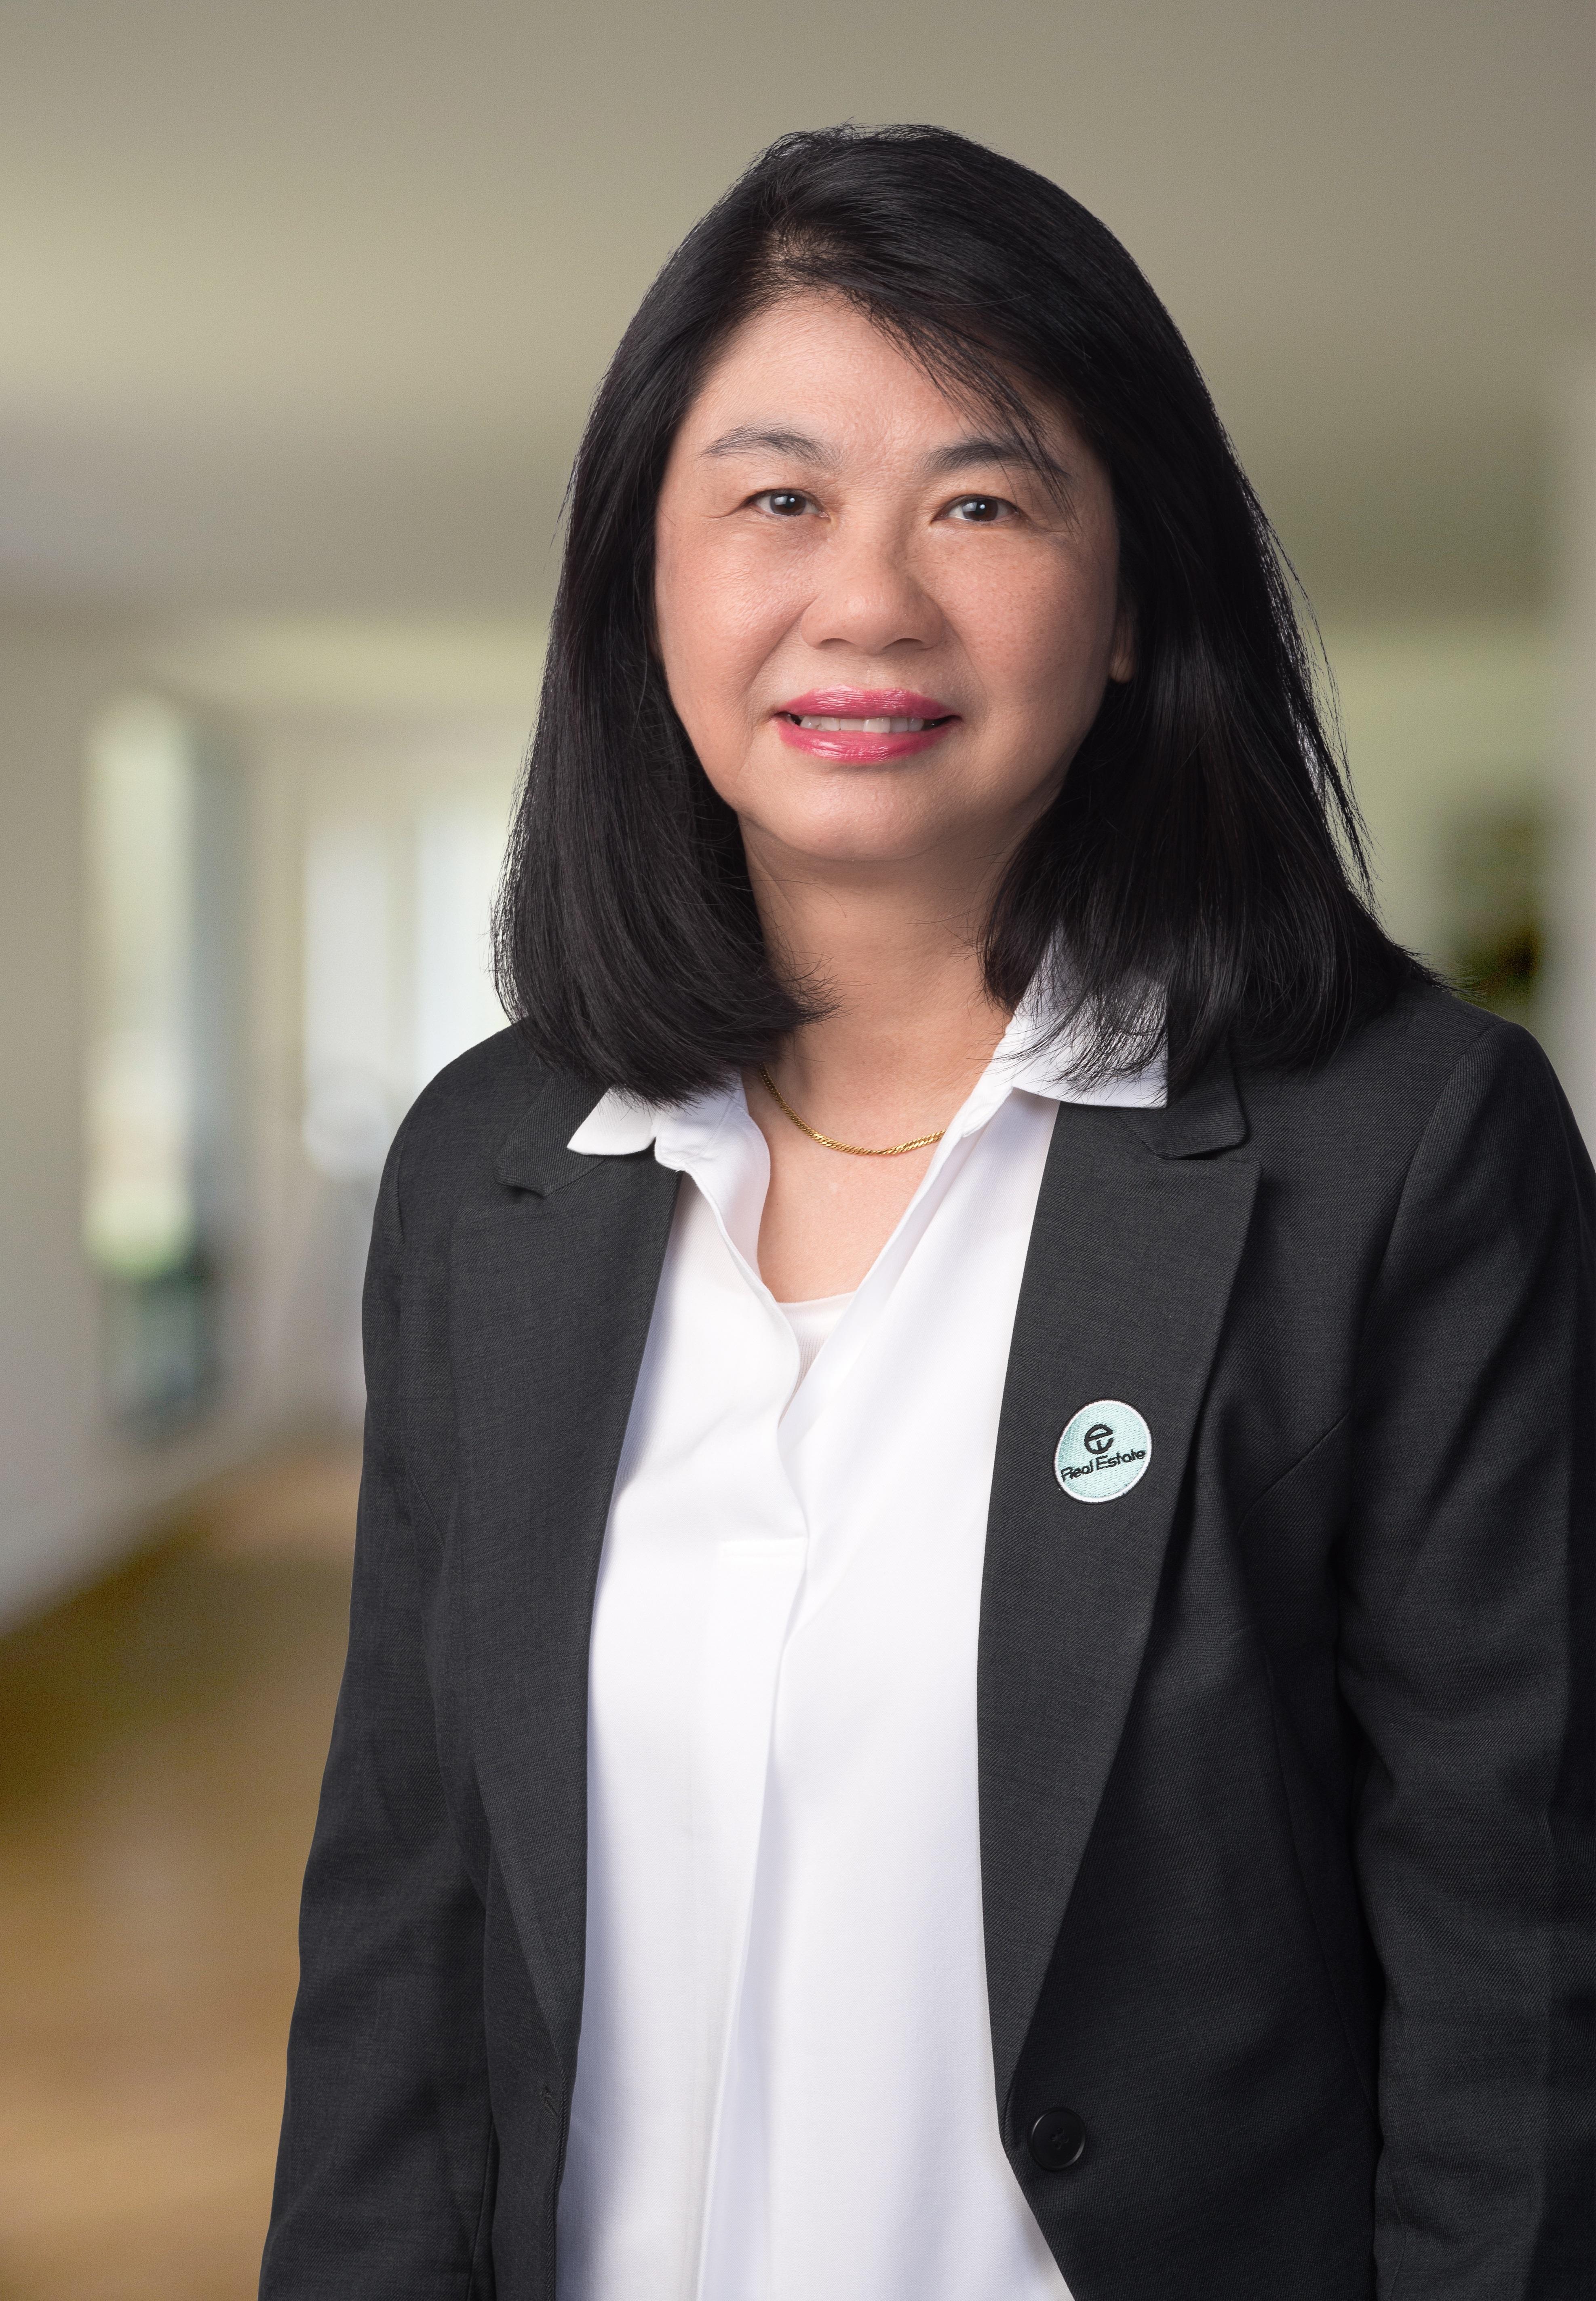 Jenny Kin Lai Yoong